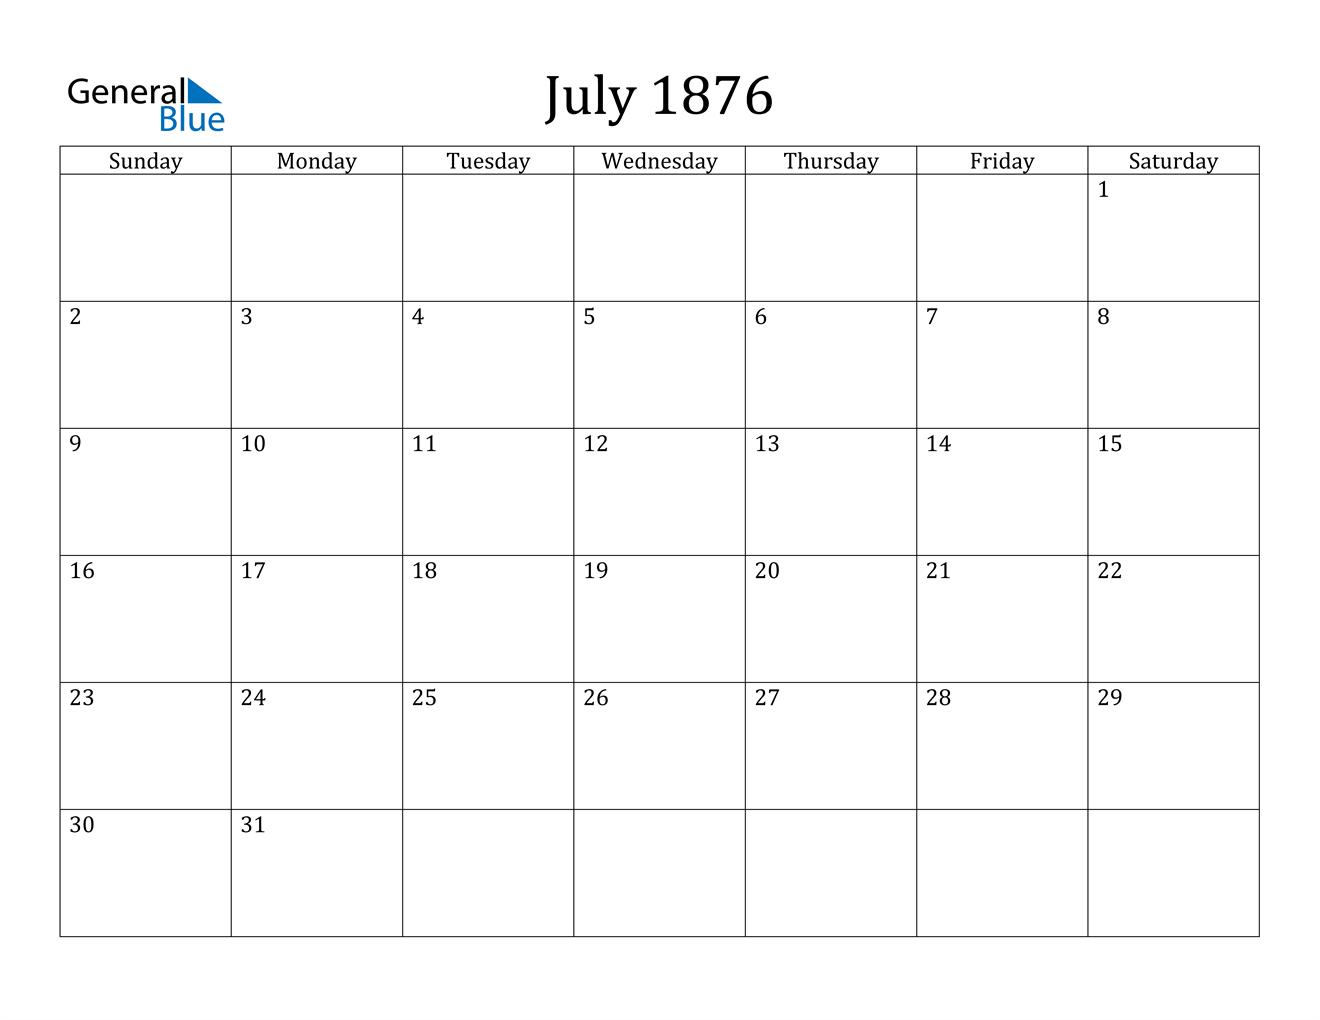 Image of July 1876 Calendar